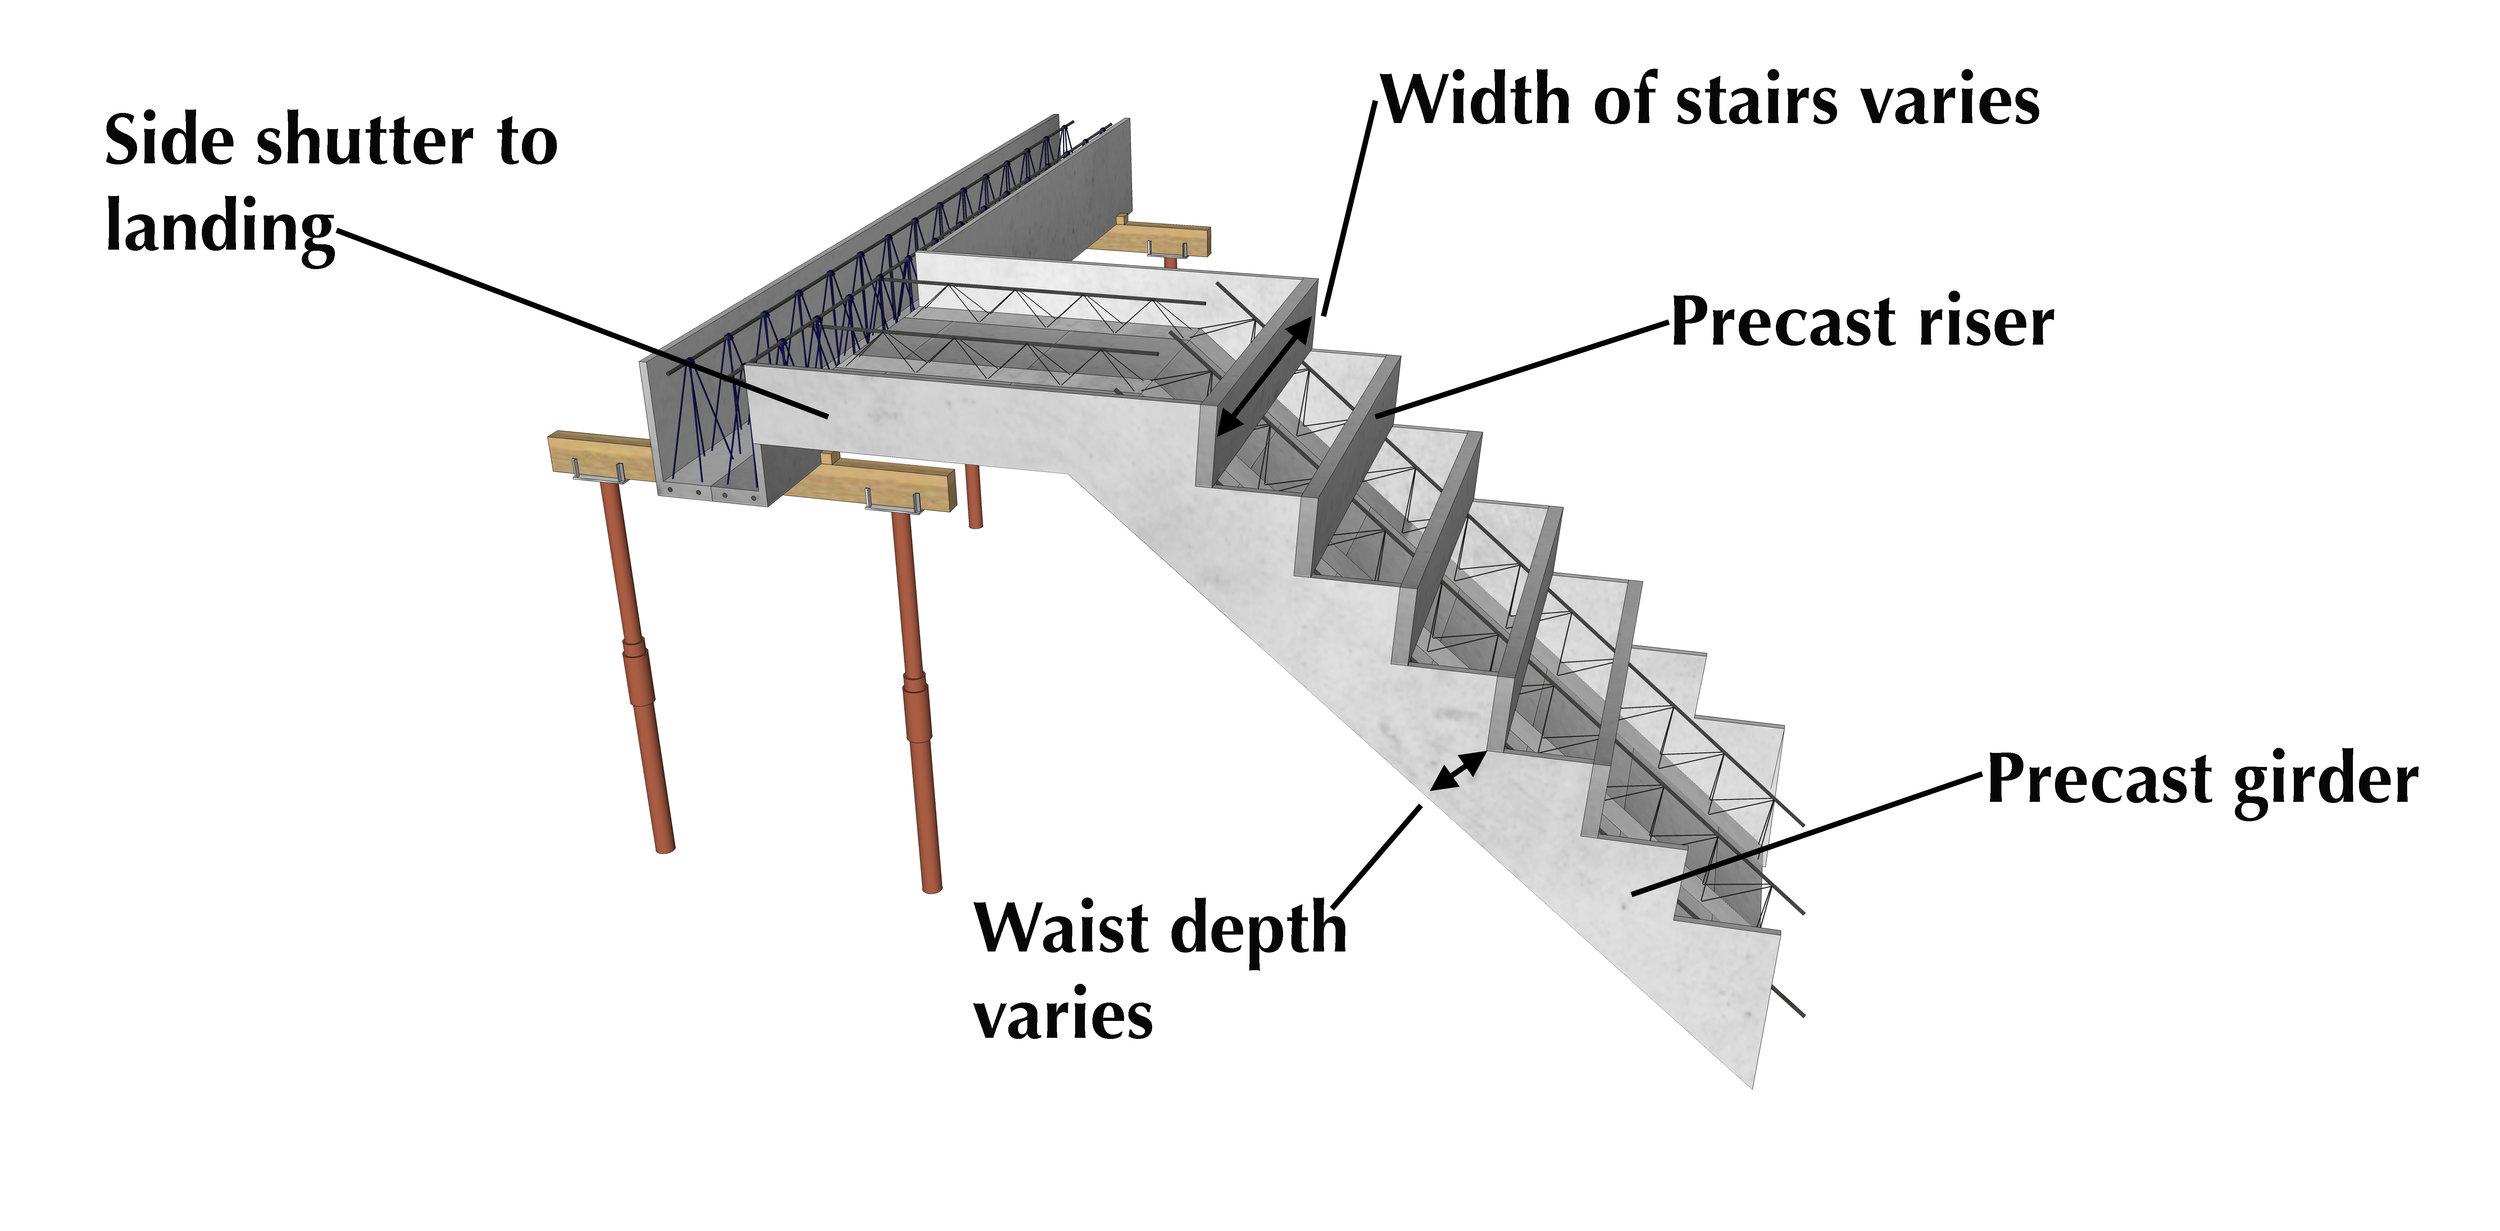 Cobute precast beam, decking and stair integration